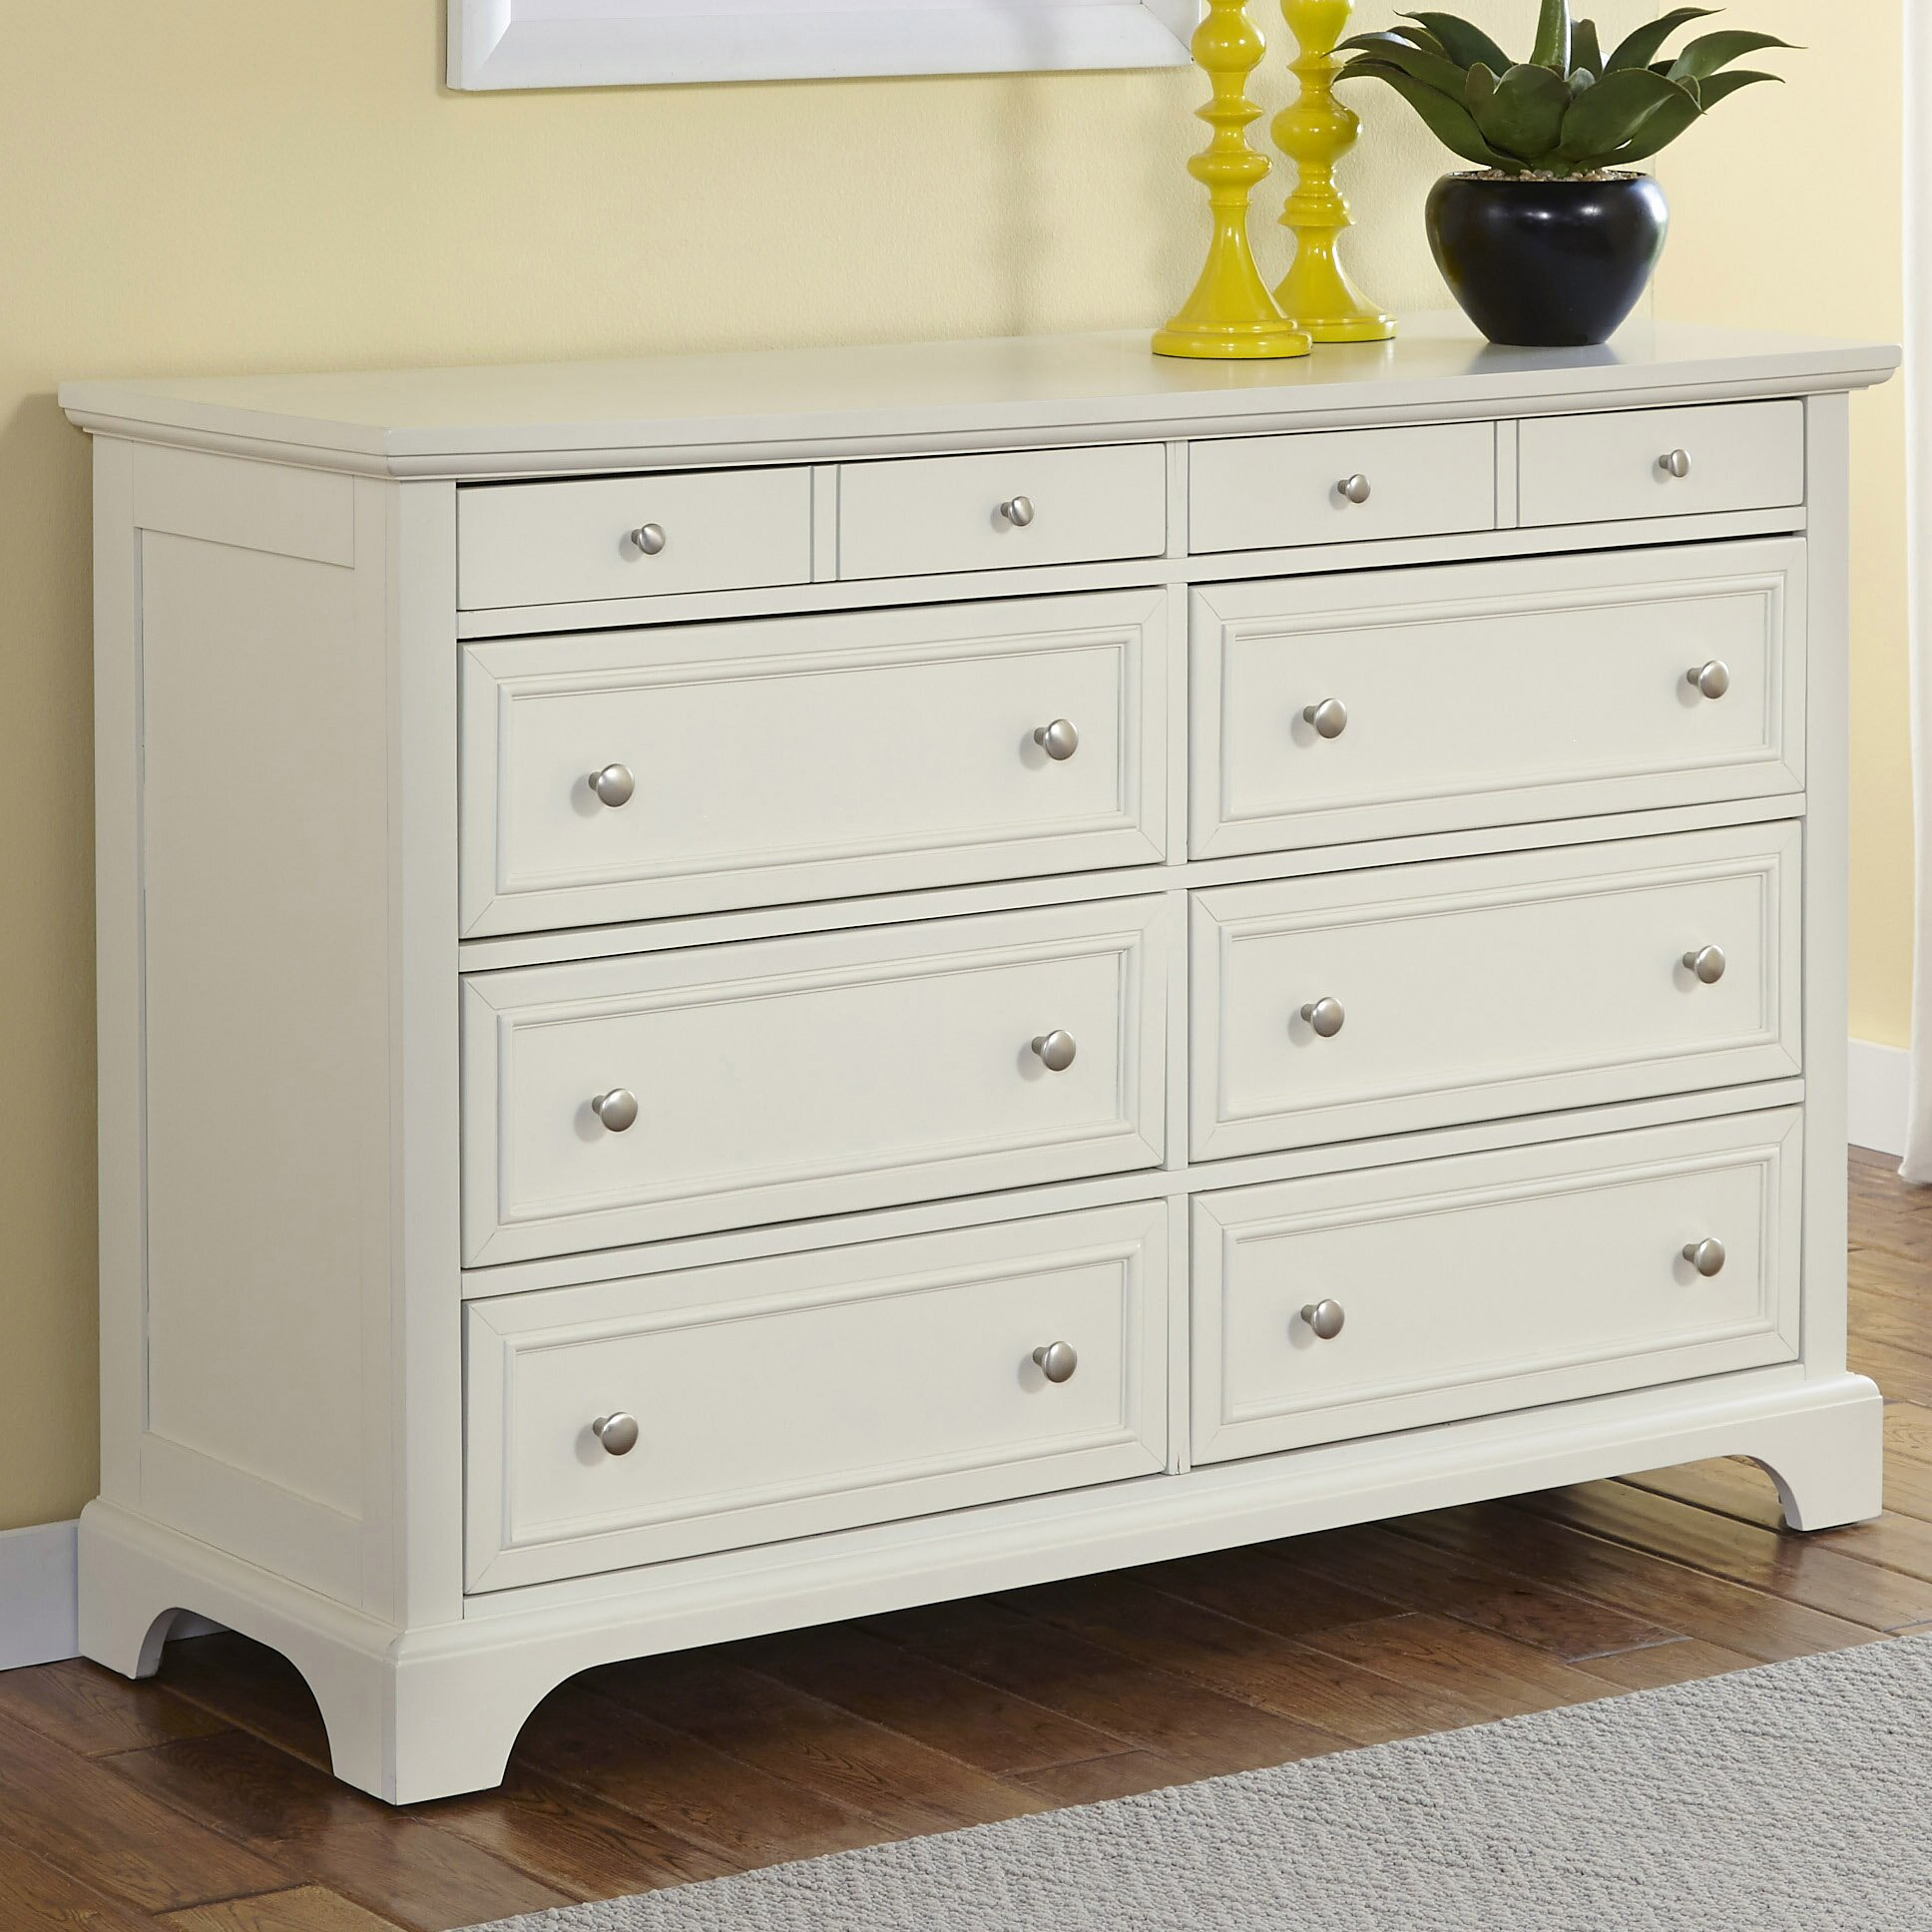 Home Styles Naples 8 Drawer Dresser Reviews